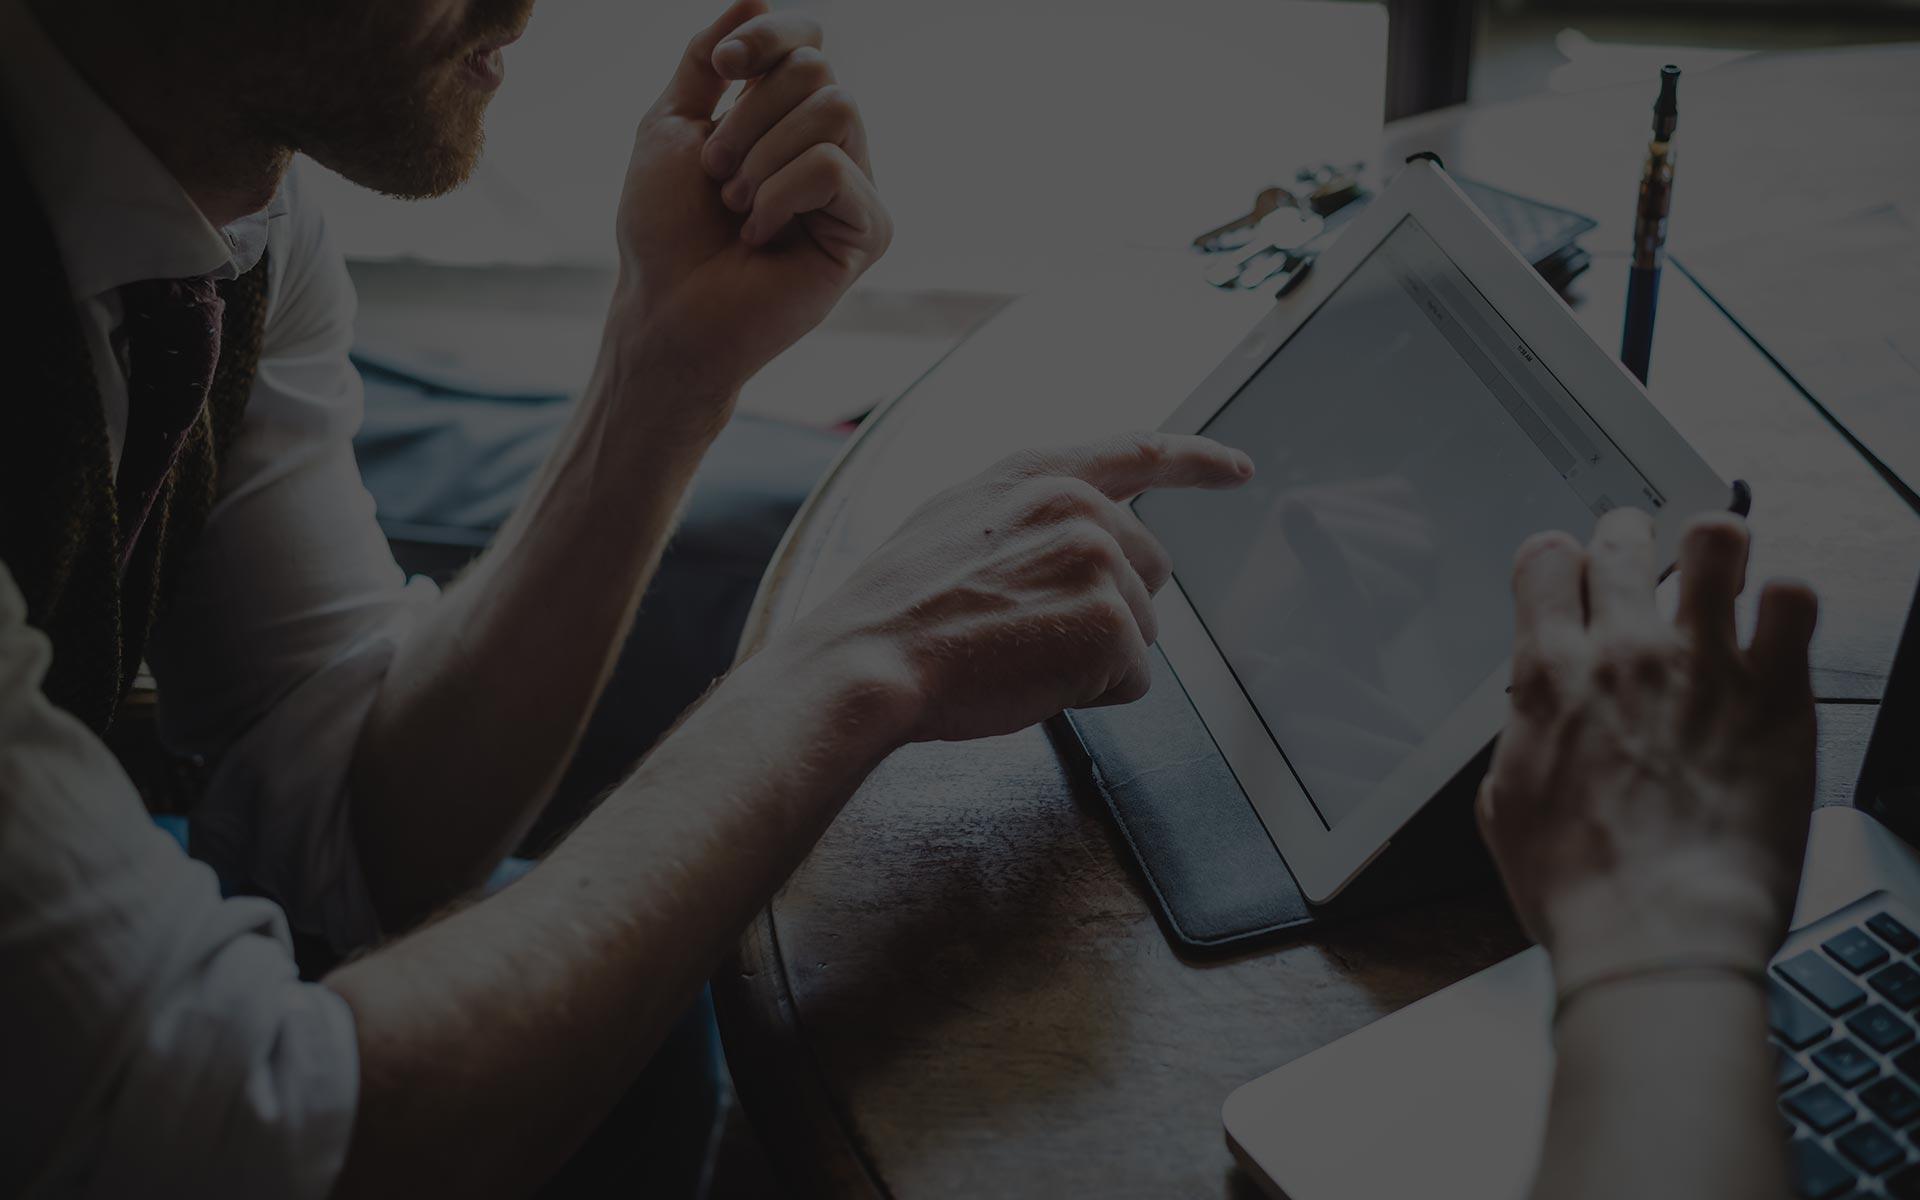 Professional Digital Marketing & SEO Specialists